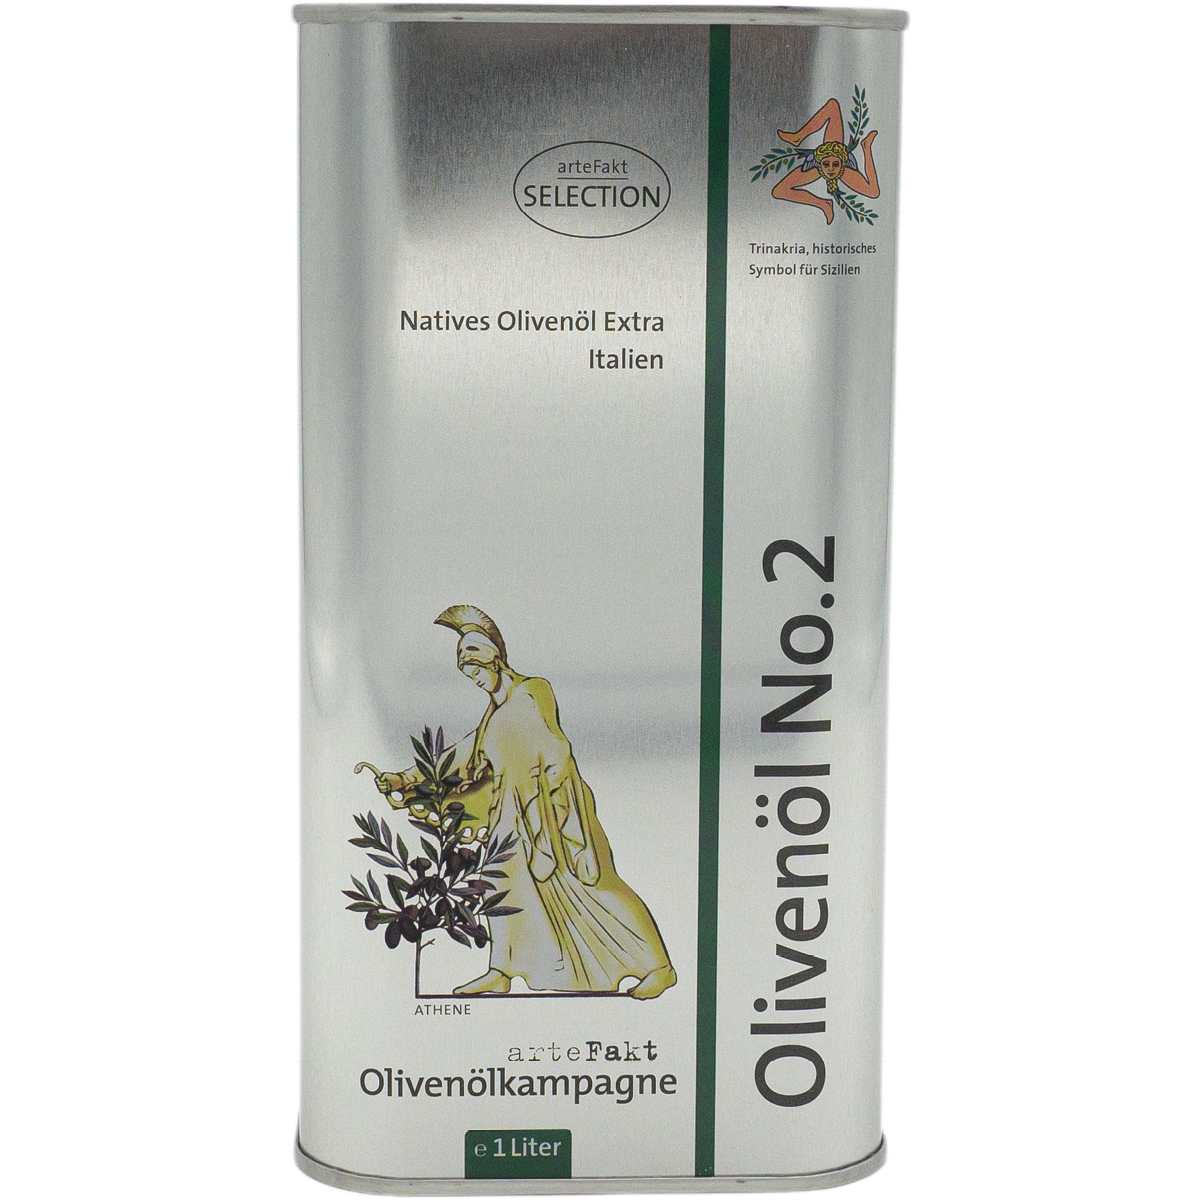 Bio Olivenöl Nativ Extra No 2; Sizilien